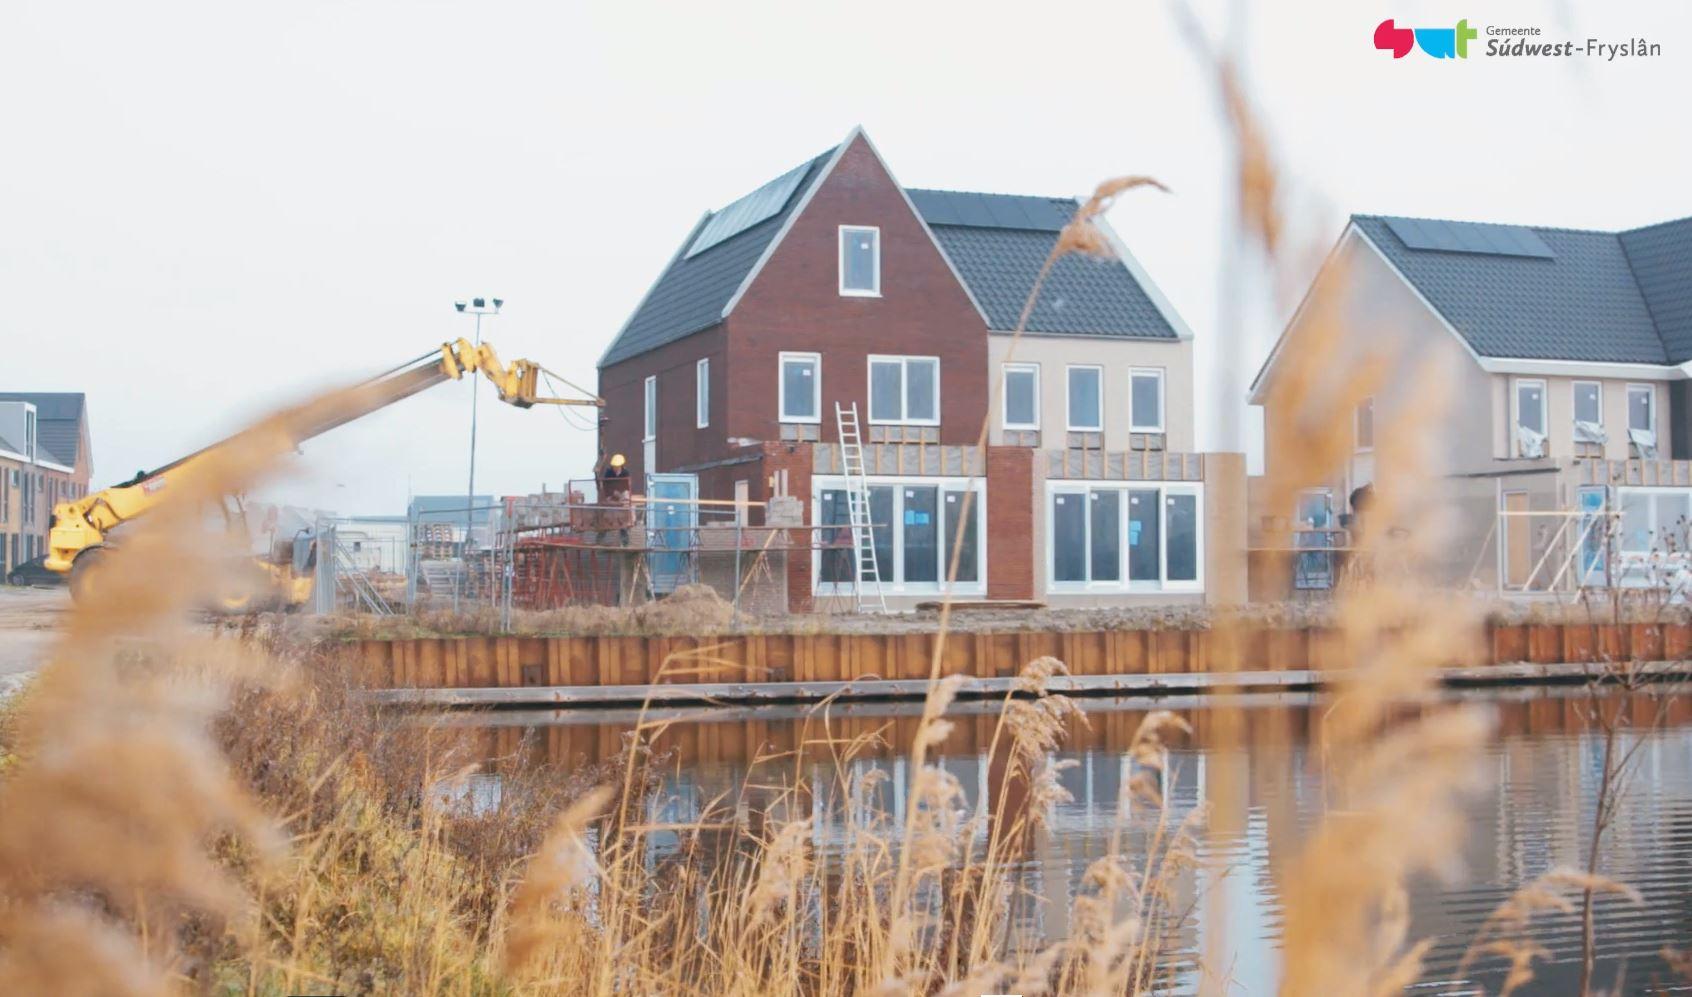 Gemeente Súd-west Fryslân